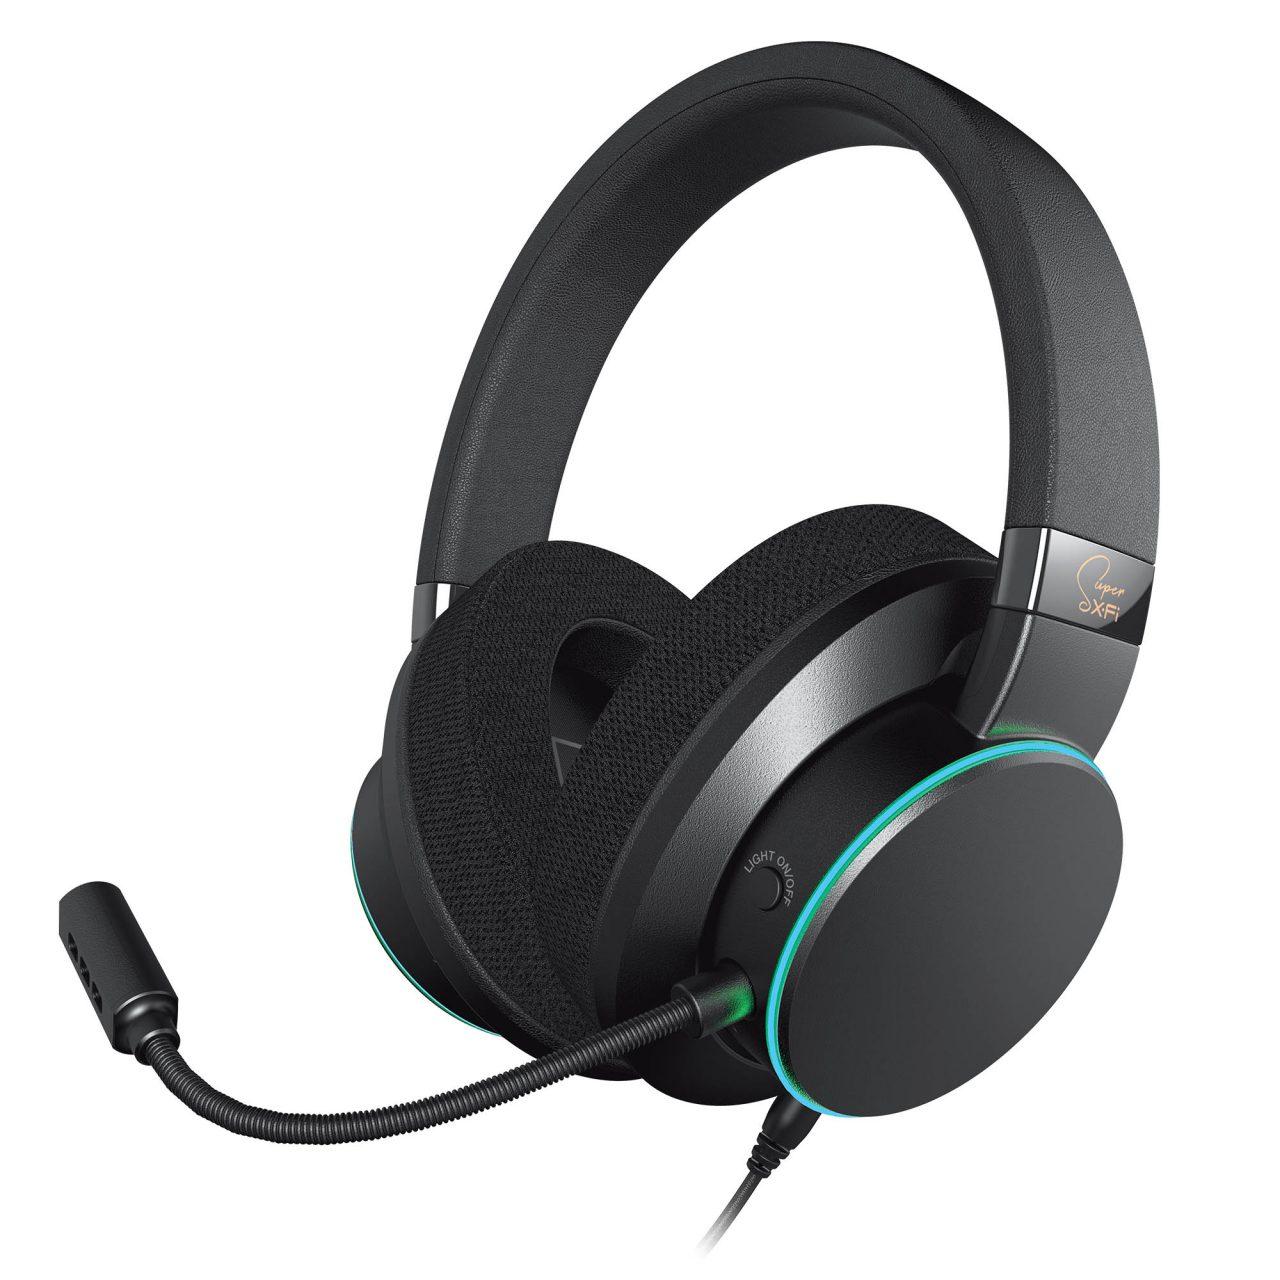 NP: Llegan los primeros auriculares Super X-Fi